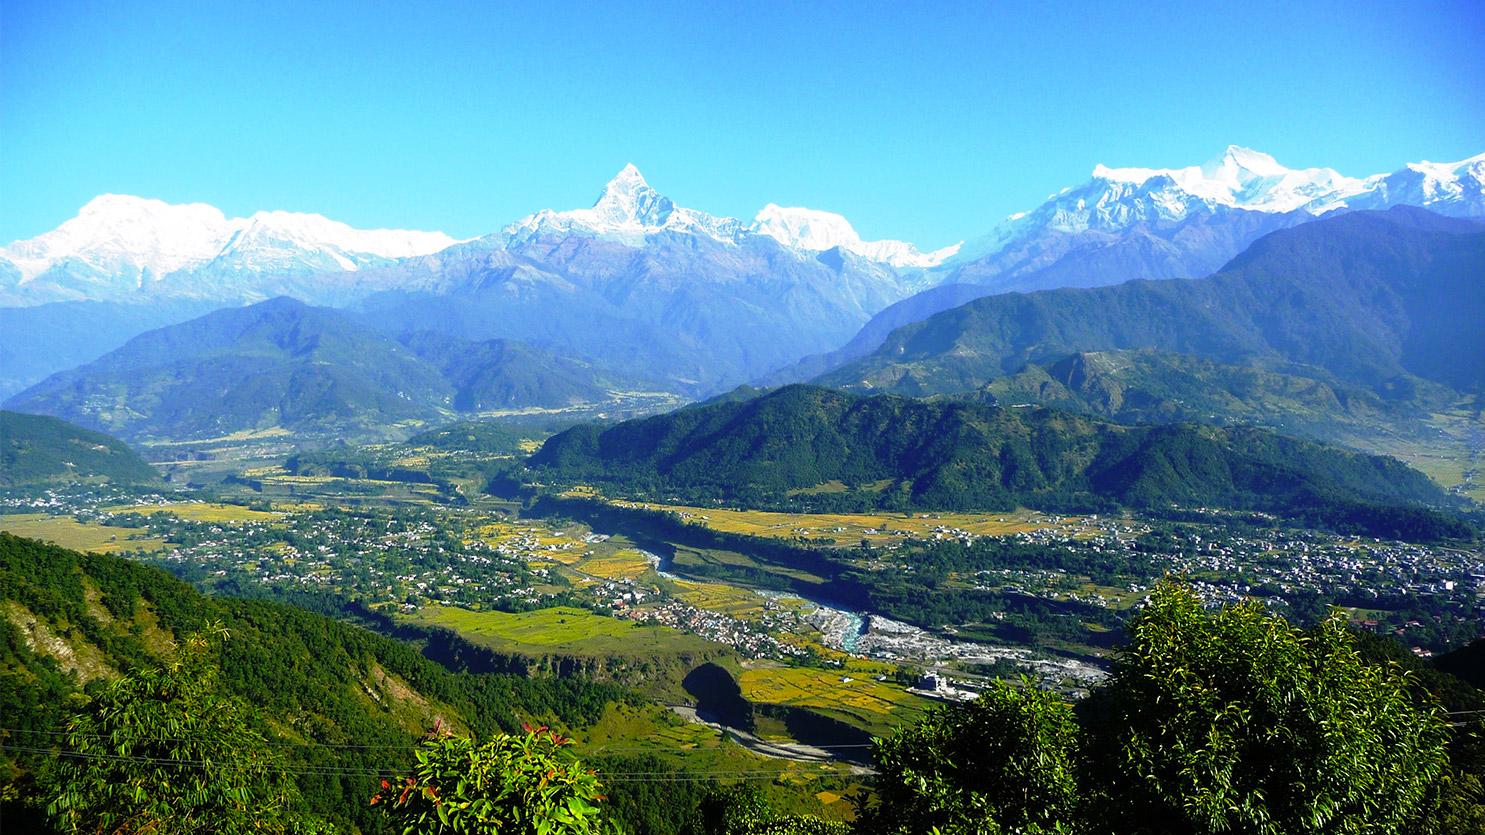 Vallée de Pokhara, vue de Sarangkot avec le Macchapuchare en toile de fond. Agence de trekking